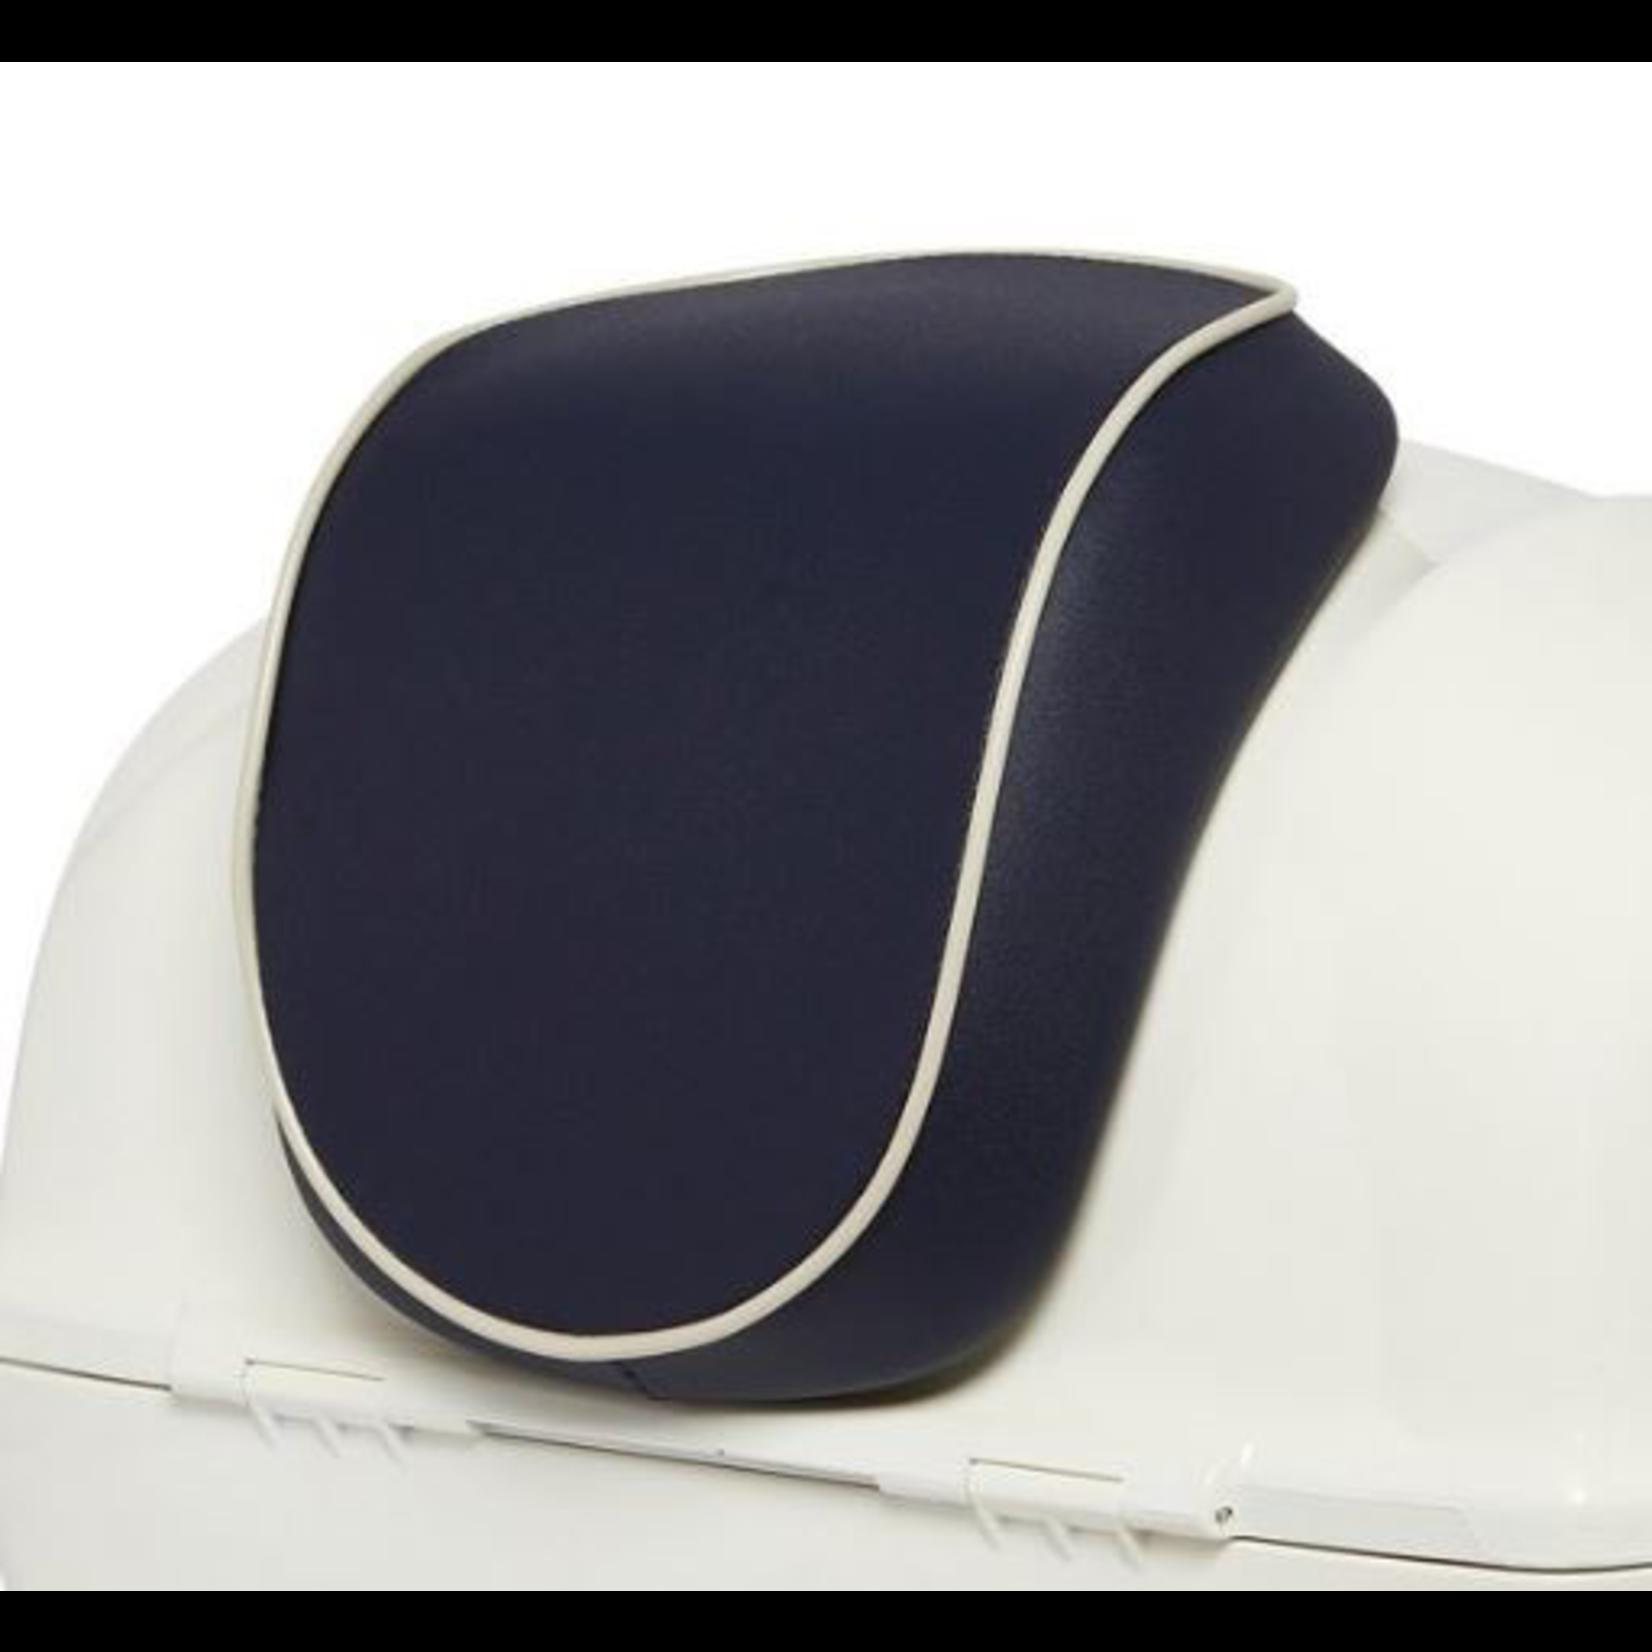 Accessories Top Case Back Rest, Primavera Yacht Club Edition